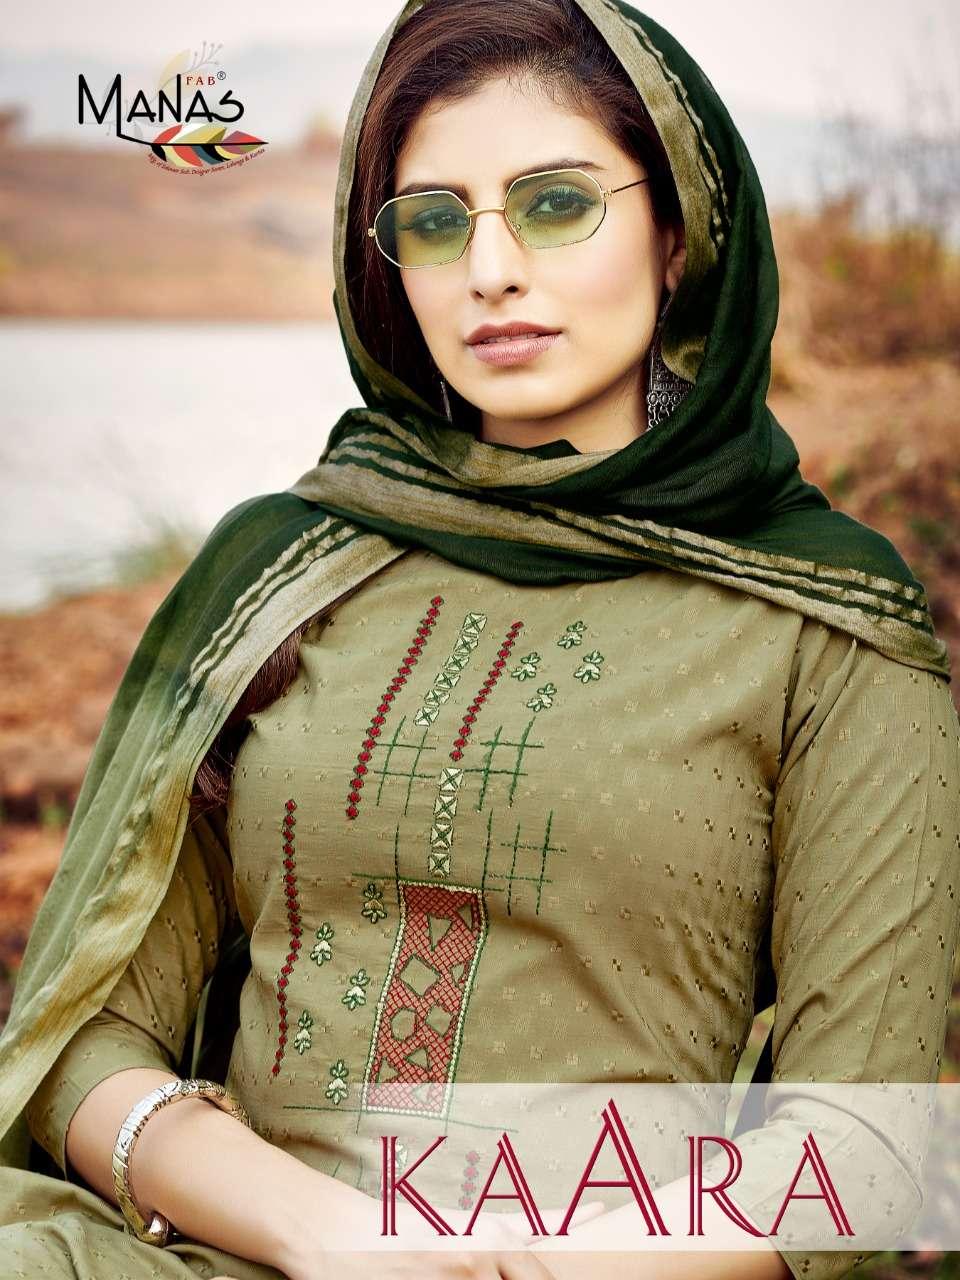 kaara by manas readymade designer classical salwar kameez indian clothing